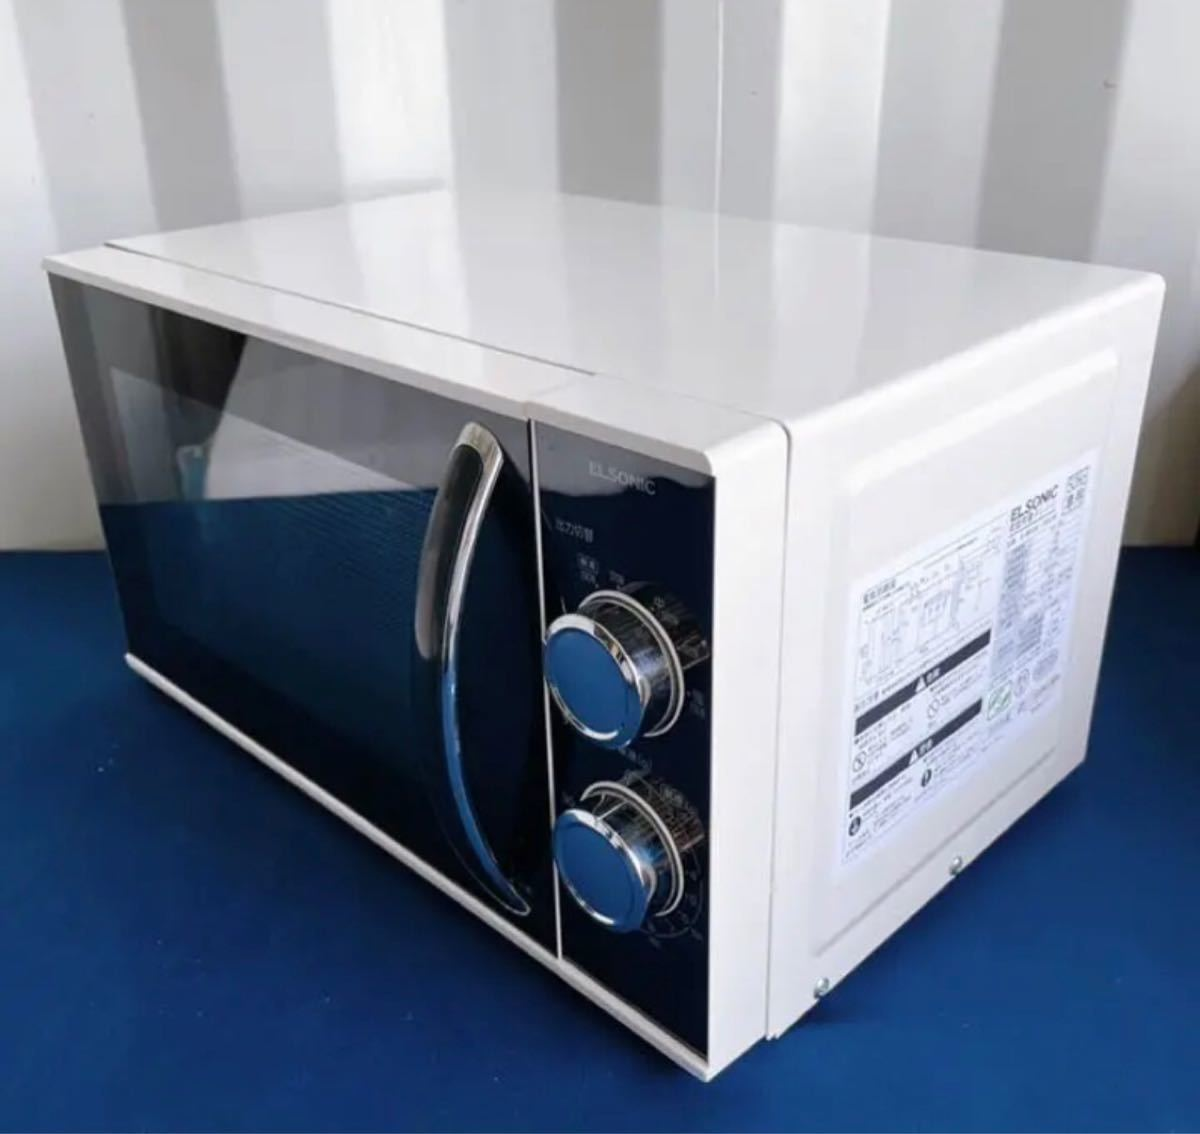 ELSONIC エルソニック 電子レンジ 50Hz専用 ピュアホワイト EG-MW7052 電子レンジ